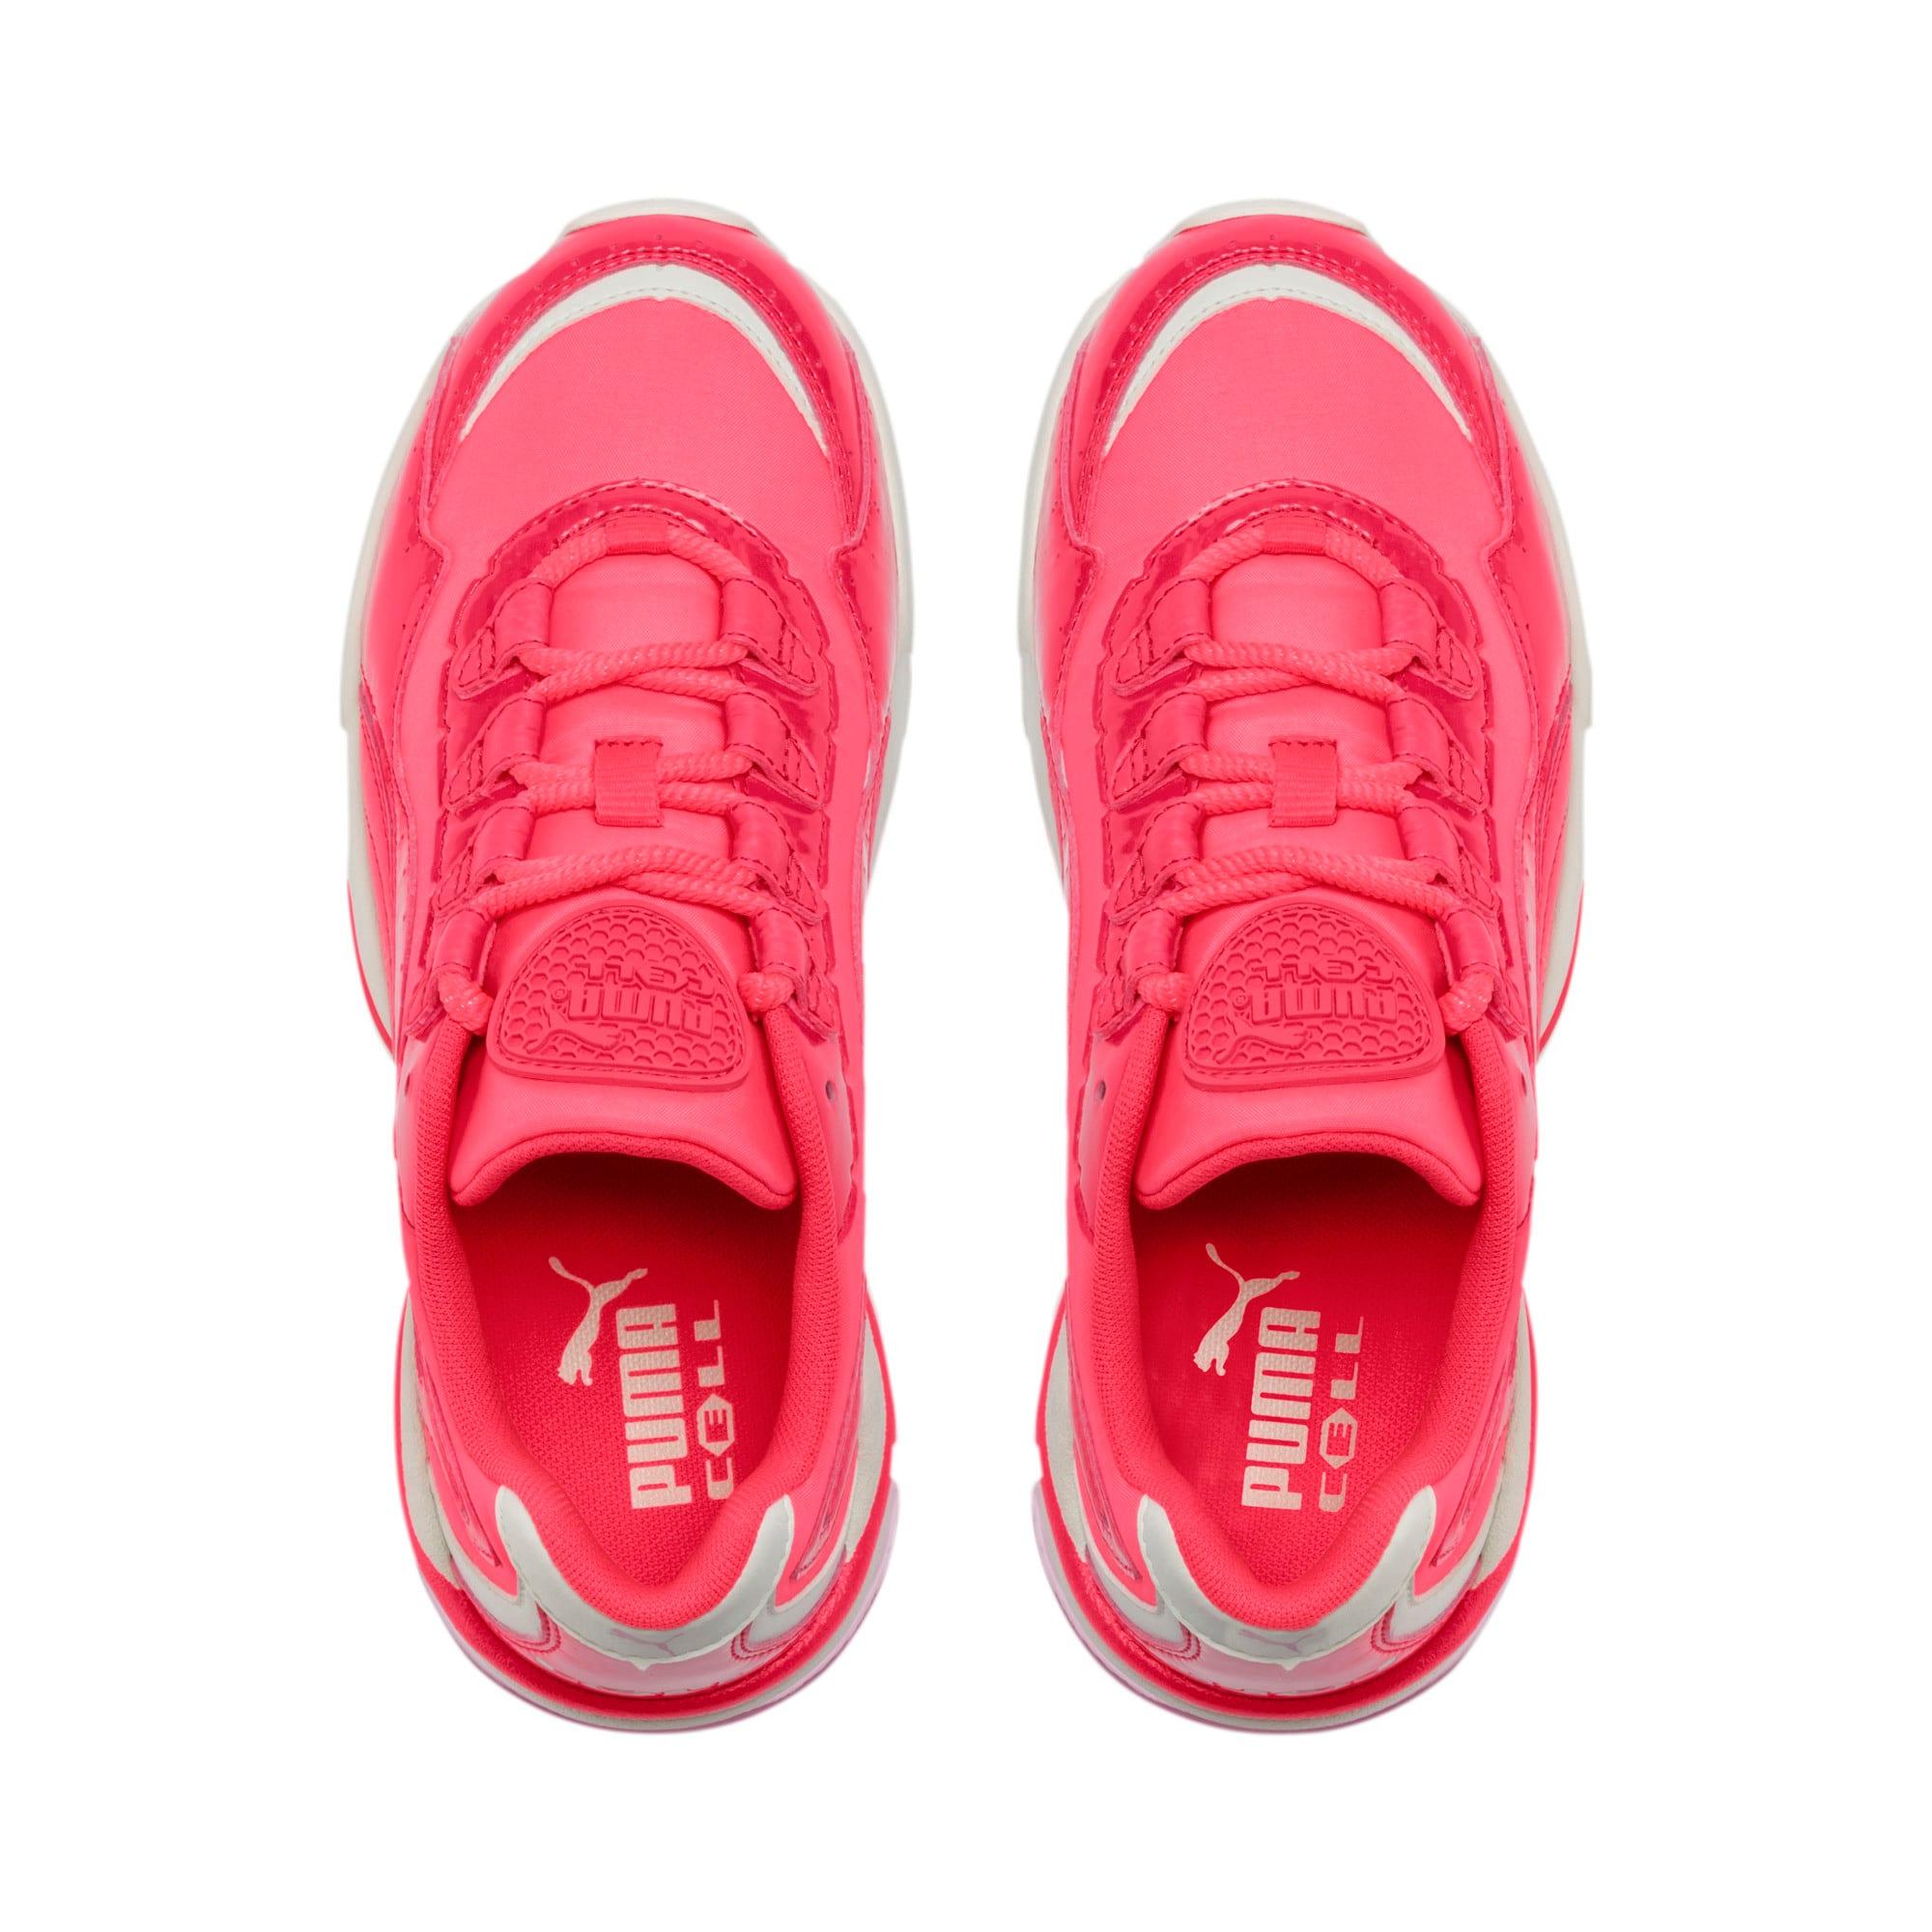 Thumbnail 7 of CELL Stellar Neon Women's Sneakers, Pink Alert-Heather, medium